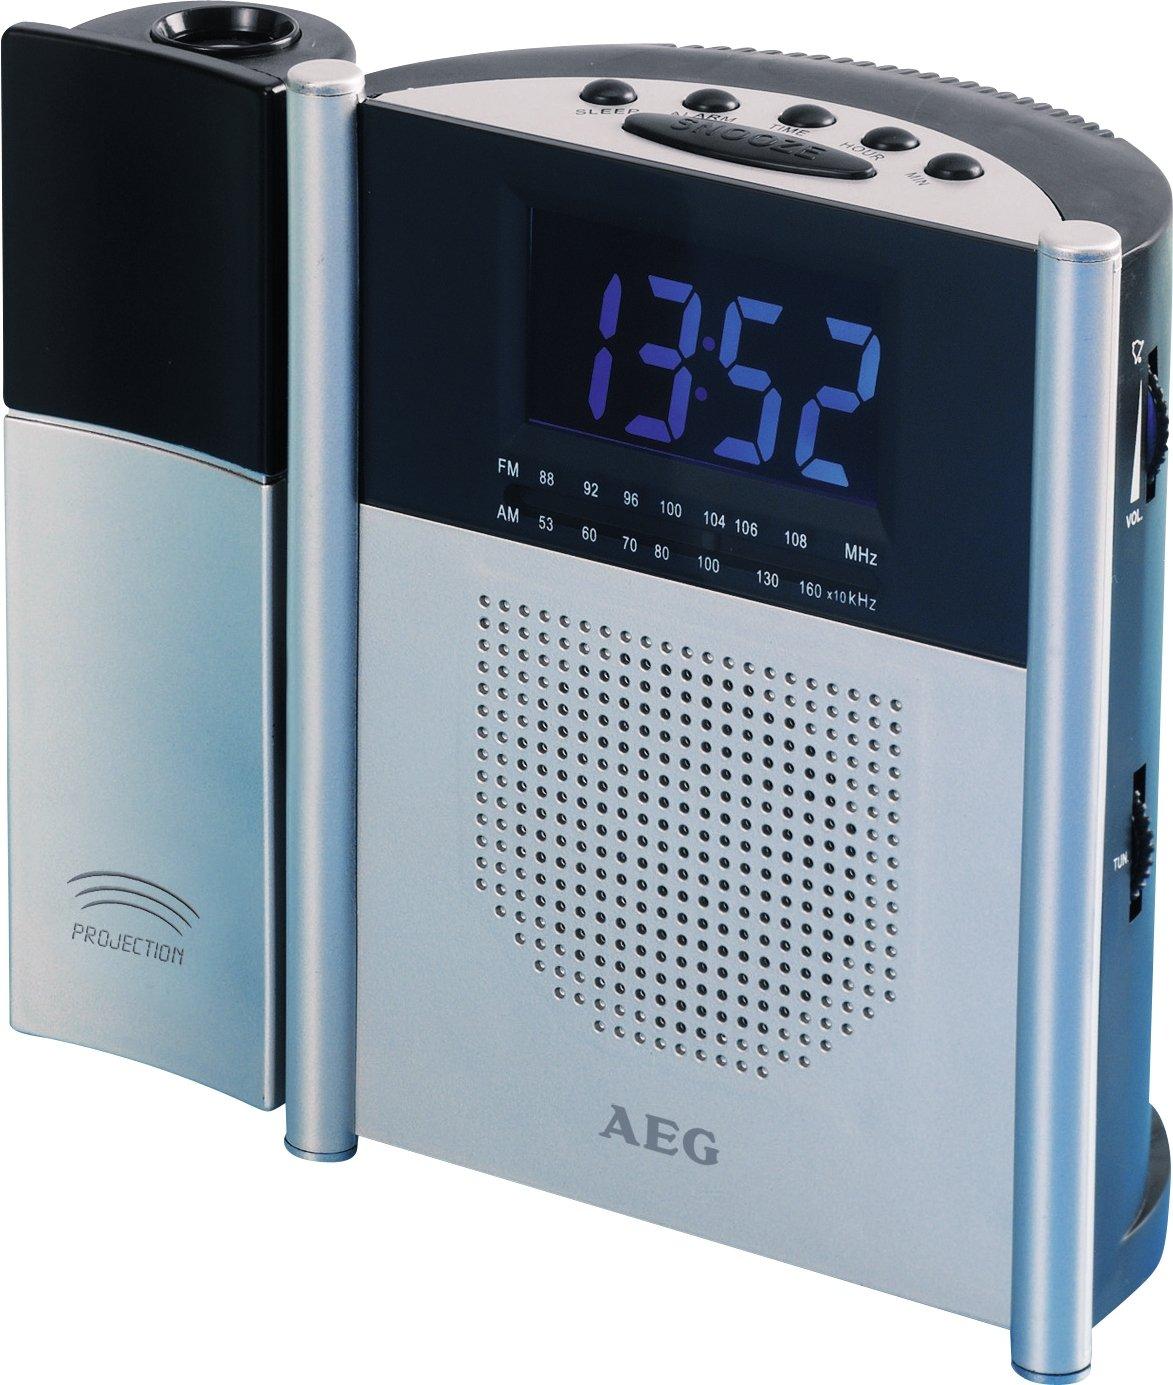 AEG MRC 4105 P - Radio despertador con proyector [importado de ...